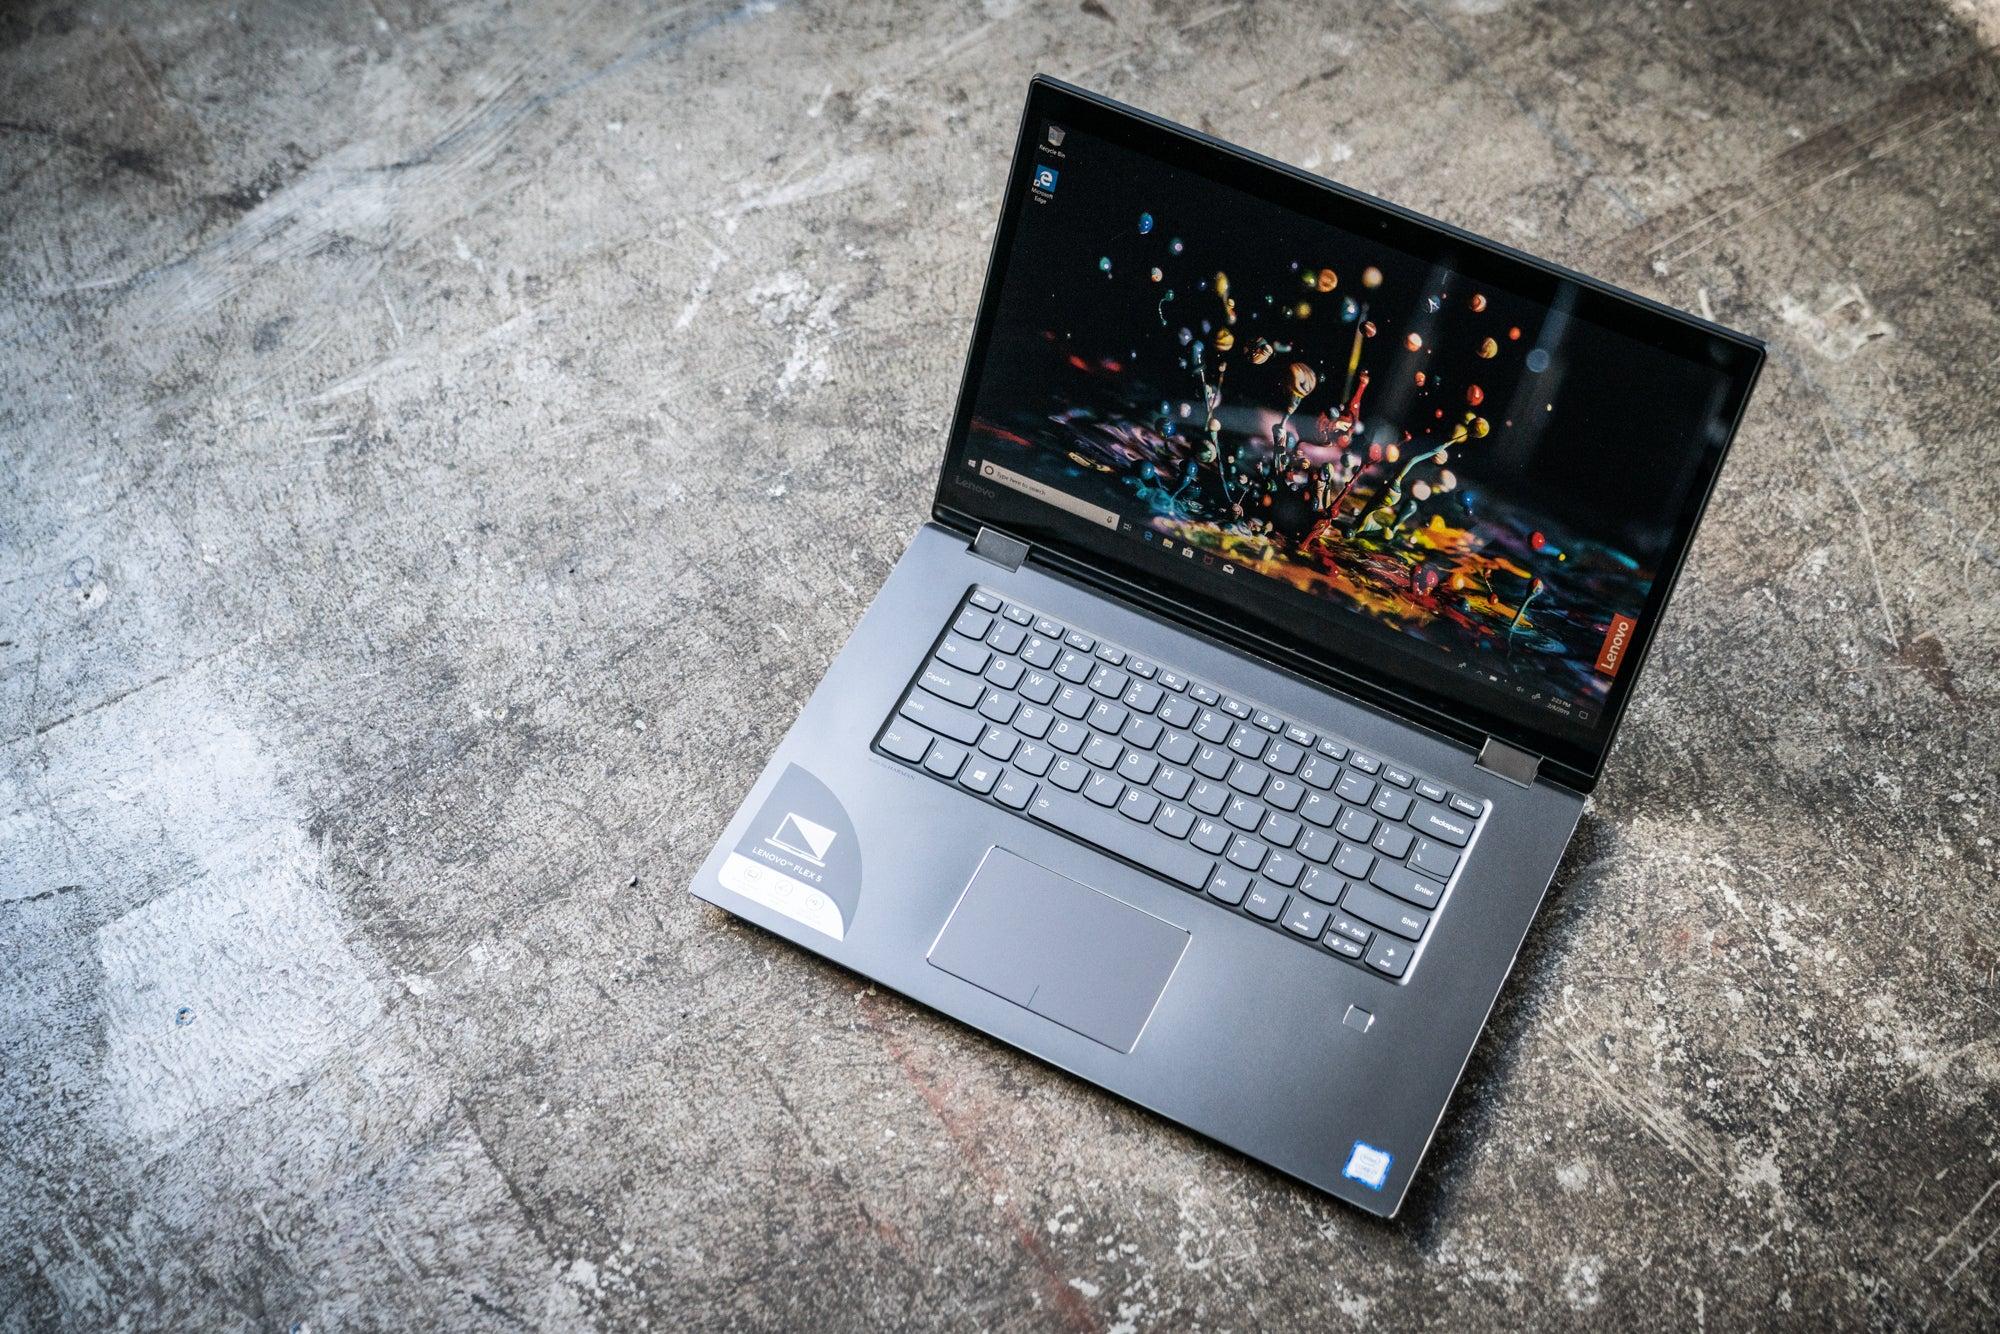 Lenovo Flex 5 15 review: A good laptop, an awkward tablet   PCWorld